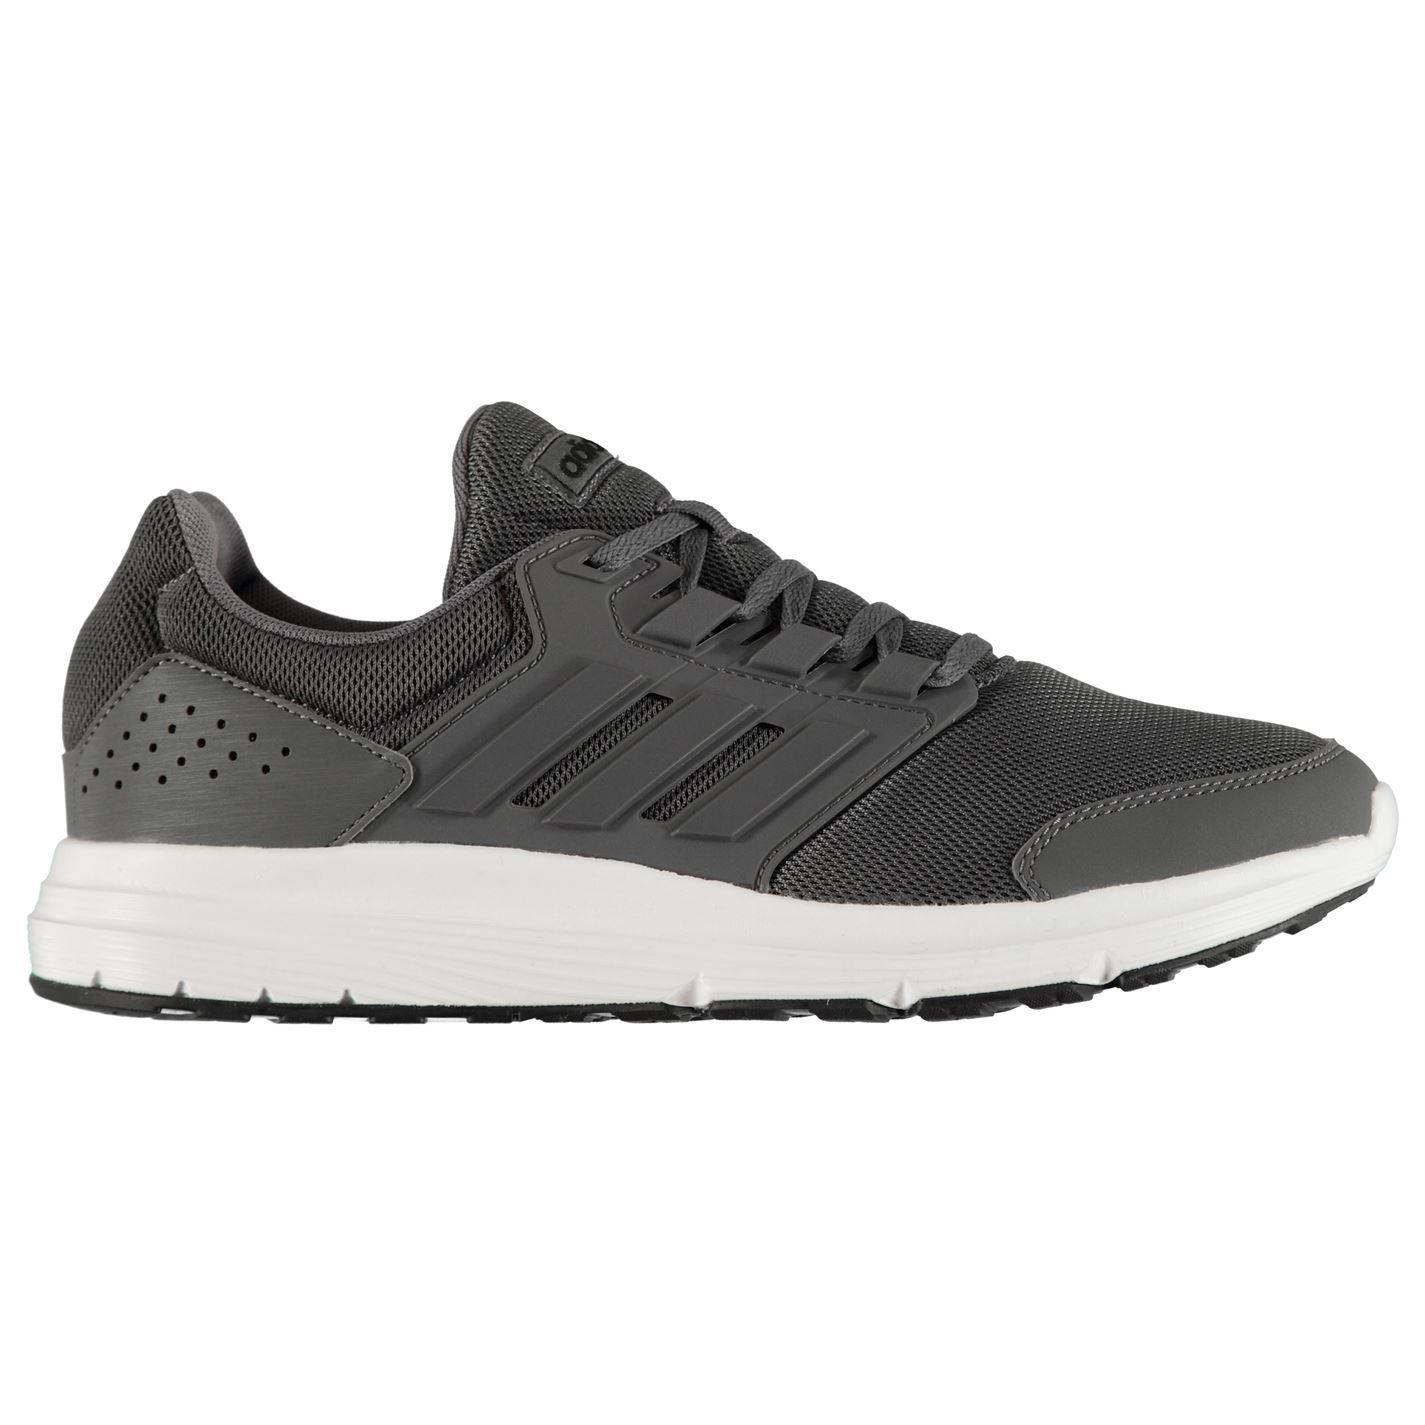 2adidas jogger hombre zapatillas